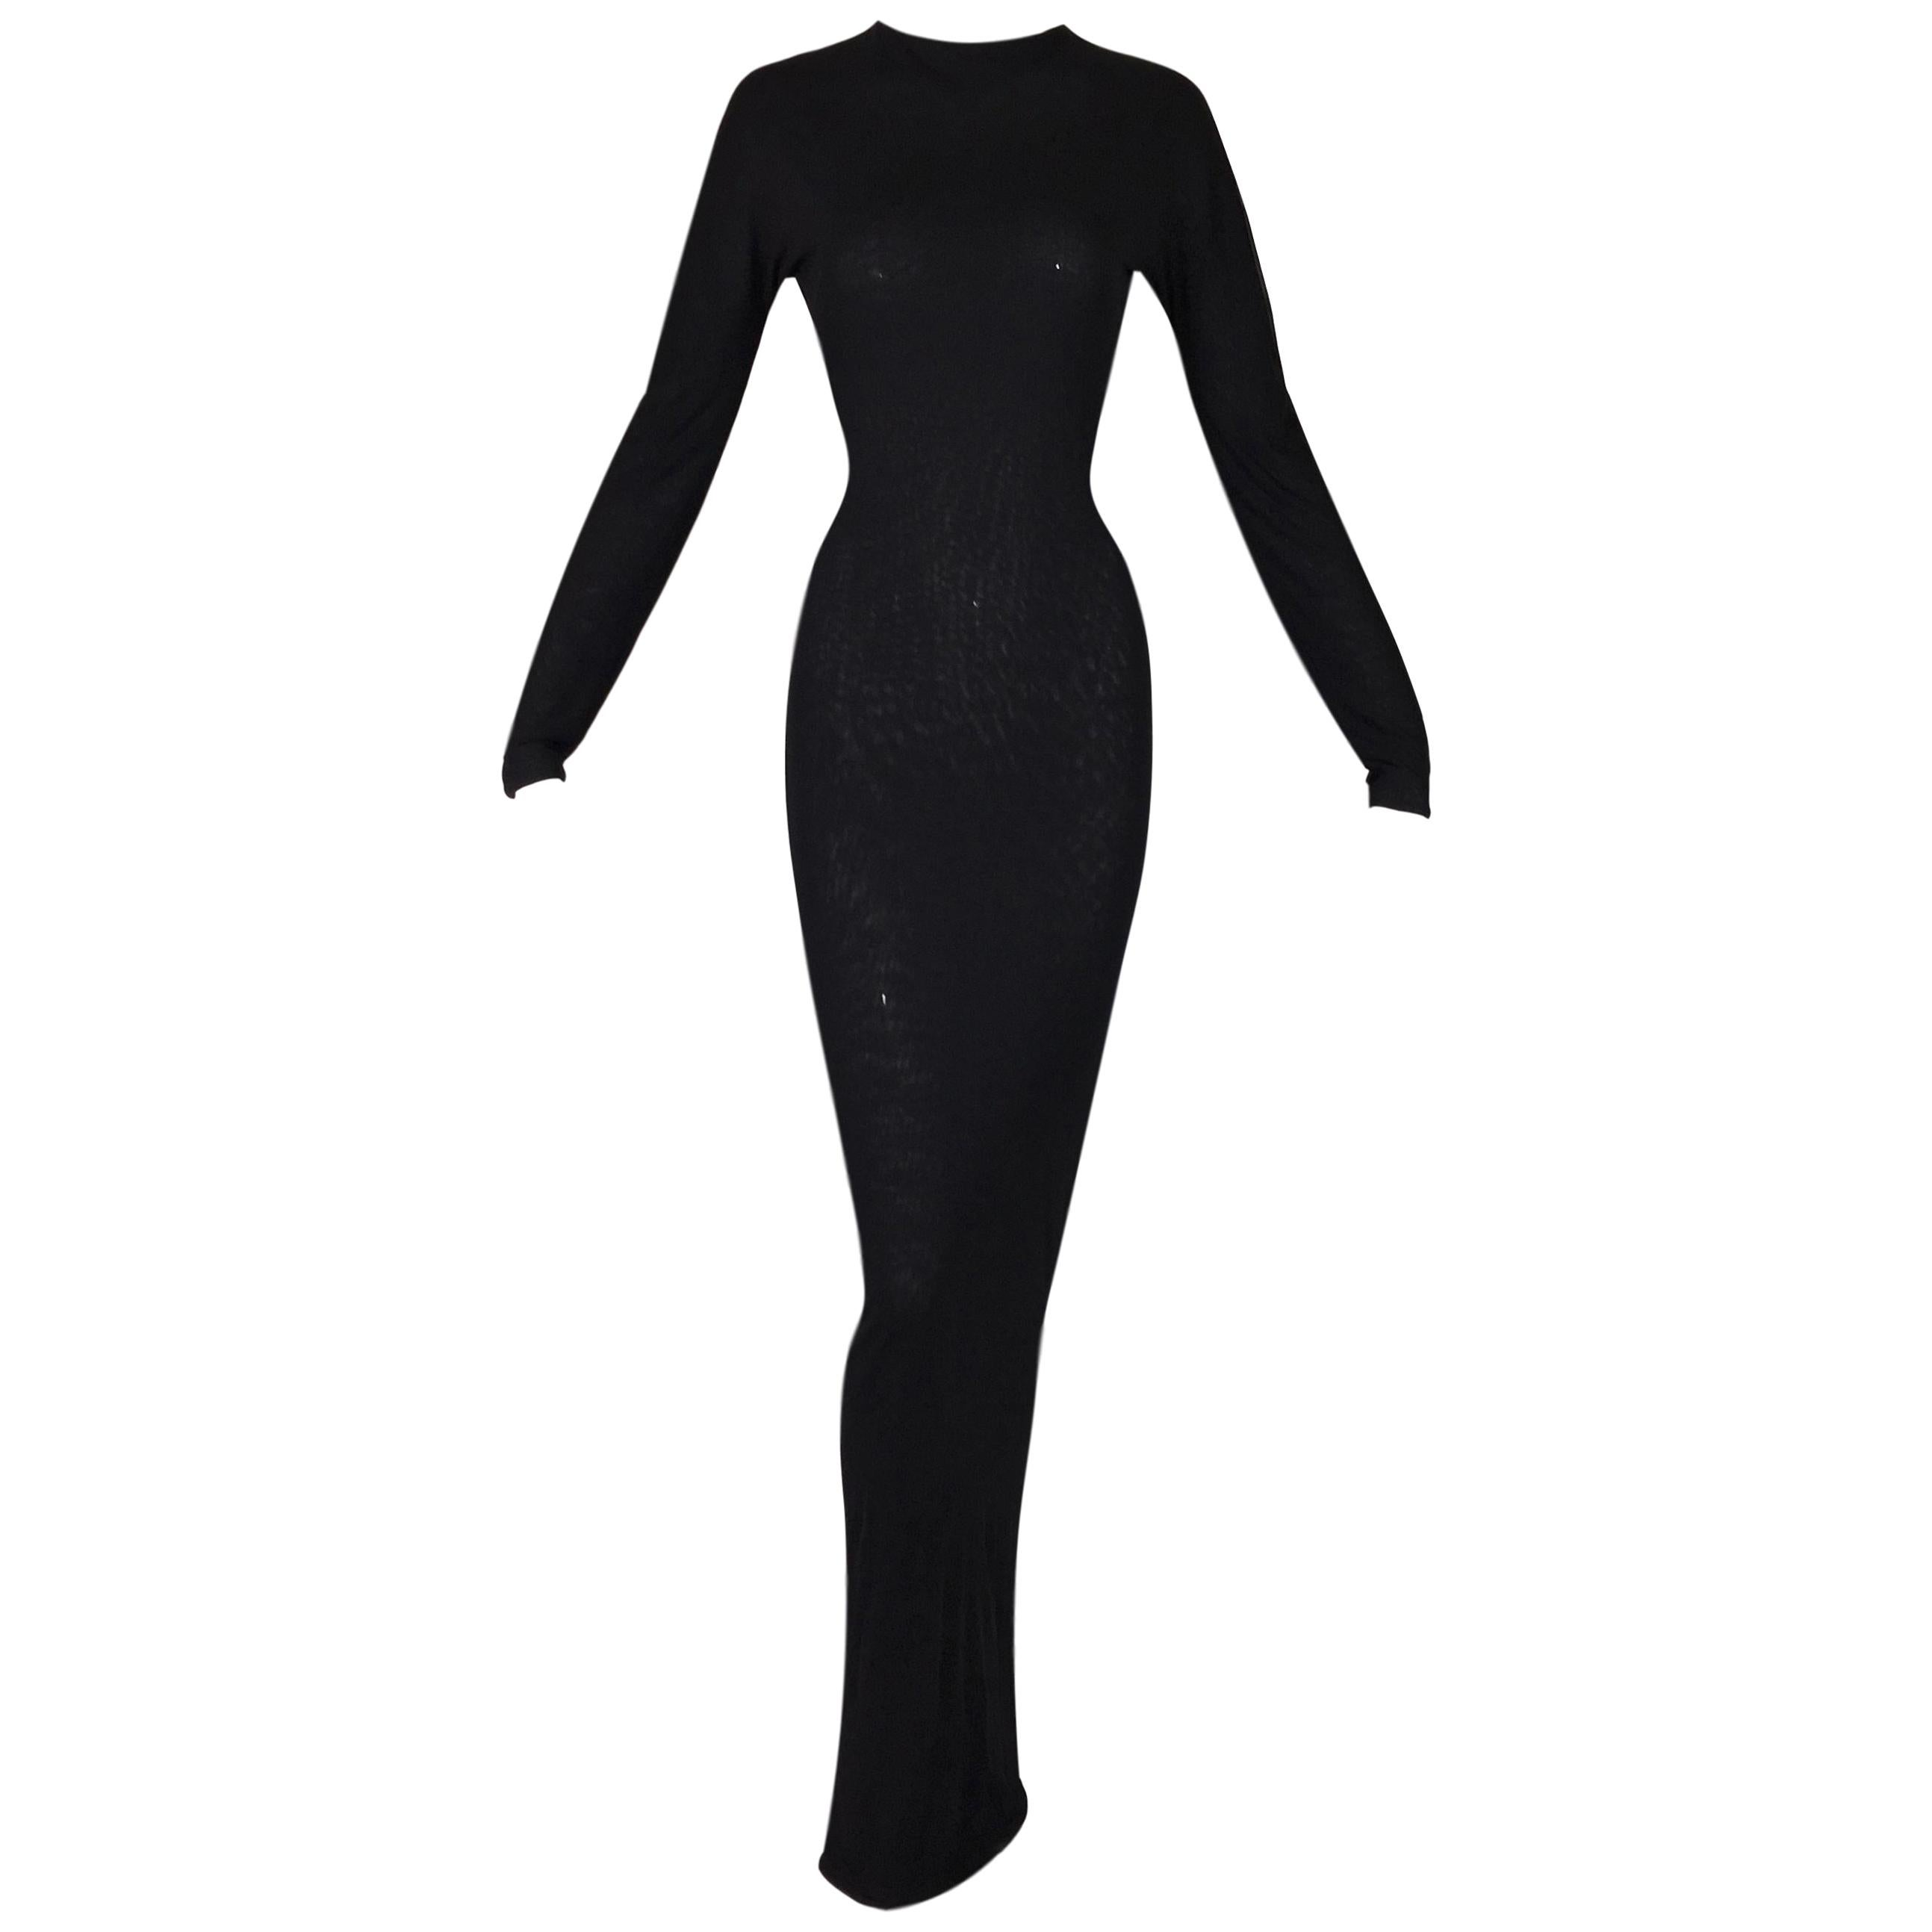 S/S 1998 Gucci Tom Ford Runway Semi-Sheer Black Bodystocking L/S Gown Dress